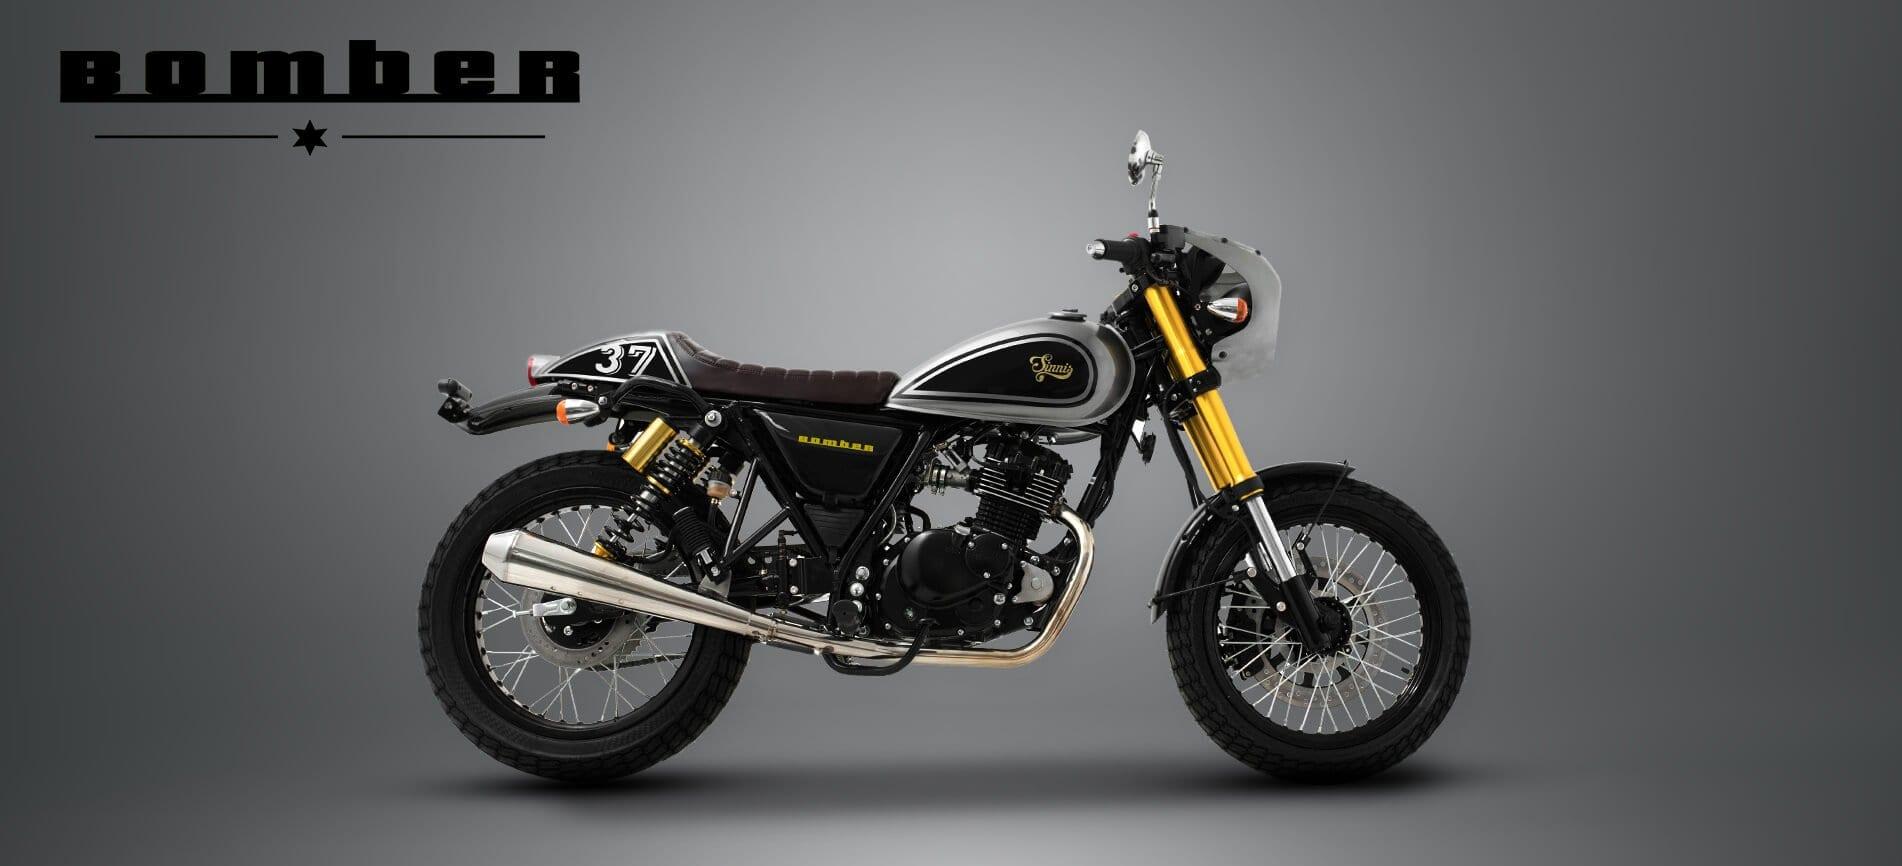 Sinnis Bomber 125cc The Best 125cc Motorcycles Uk